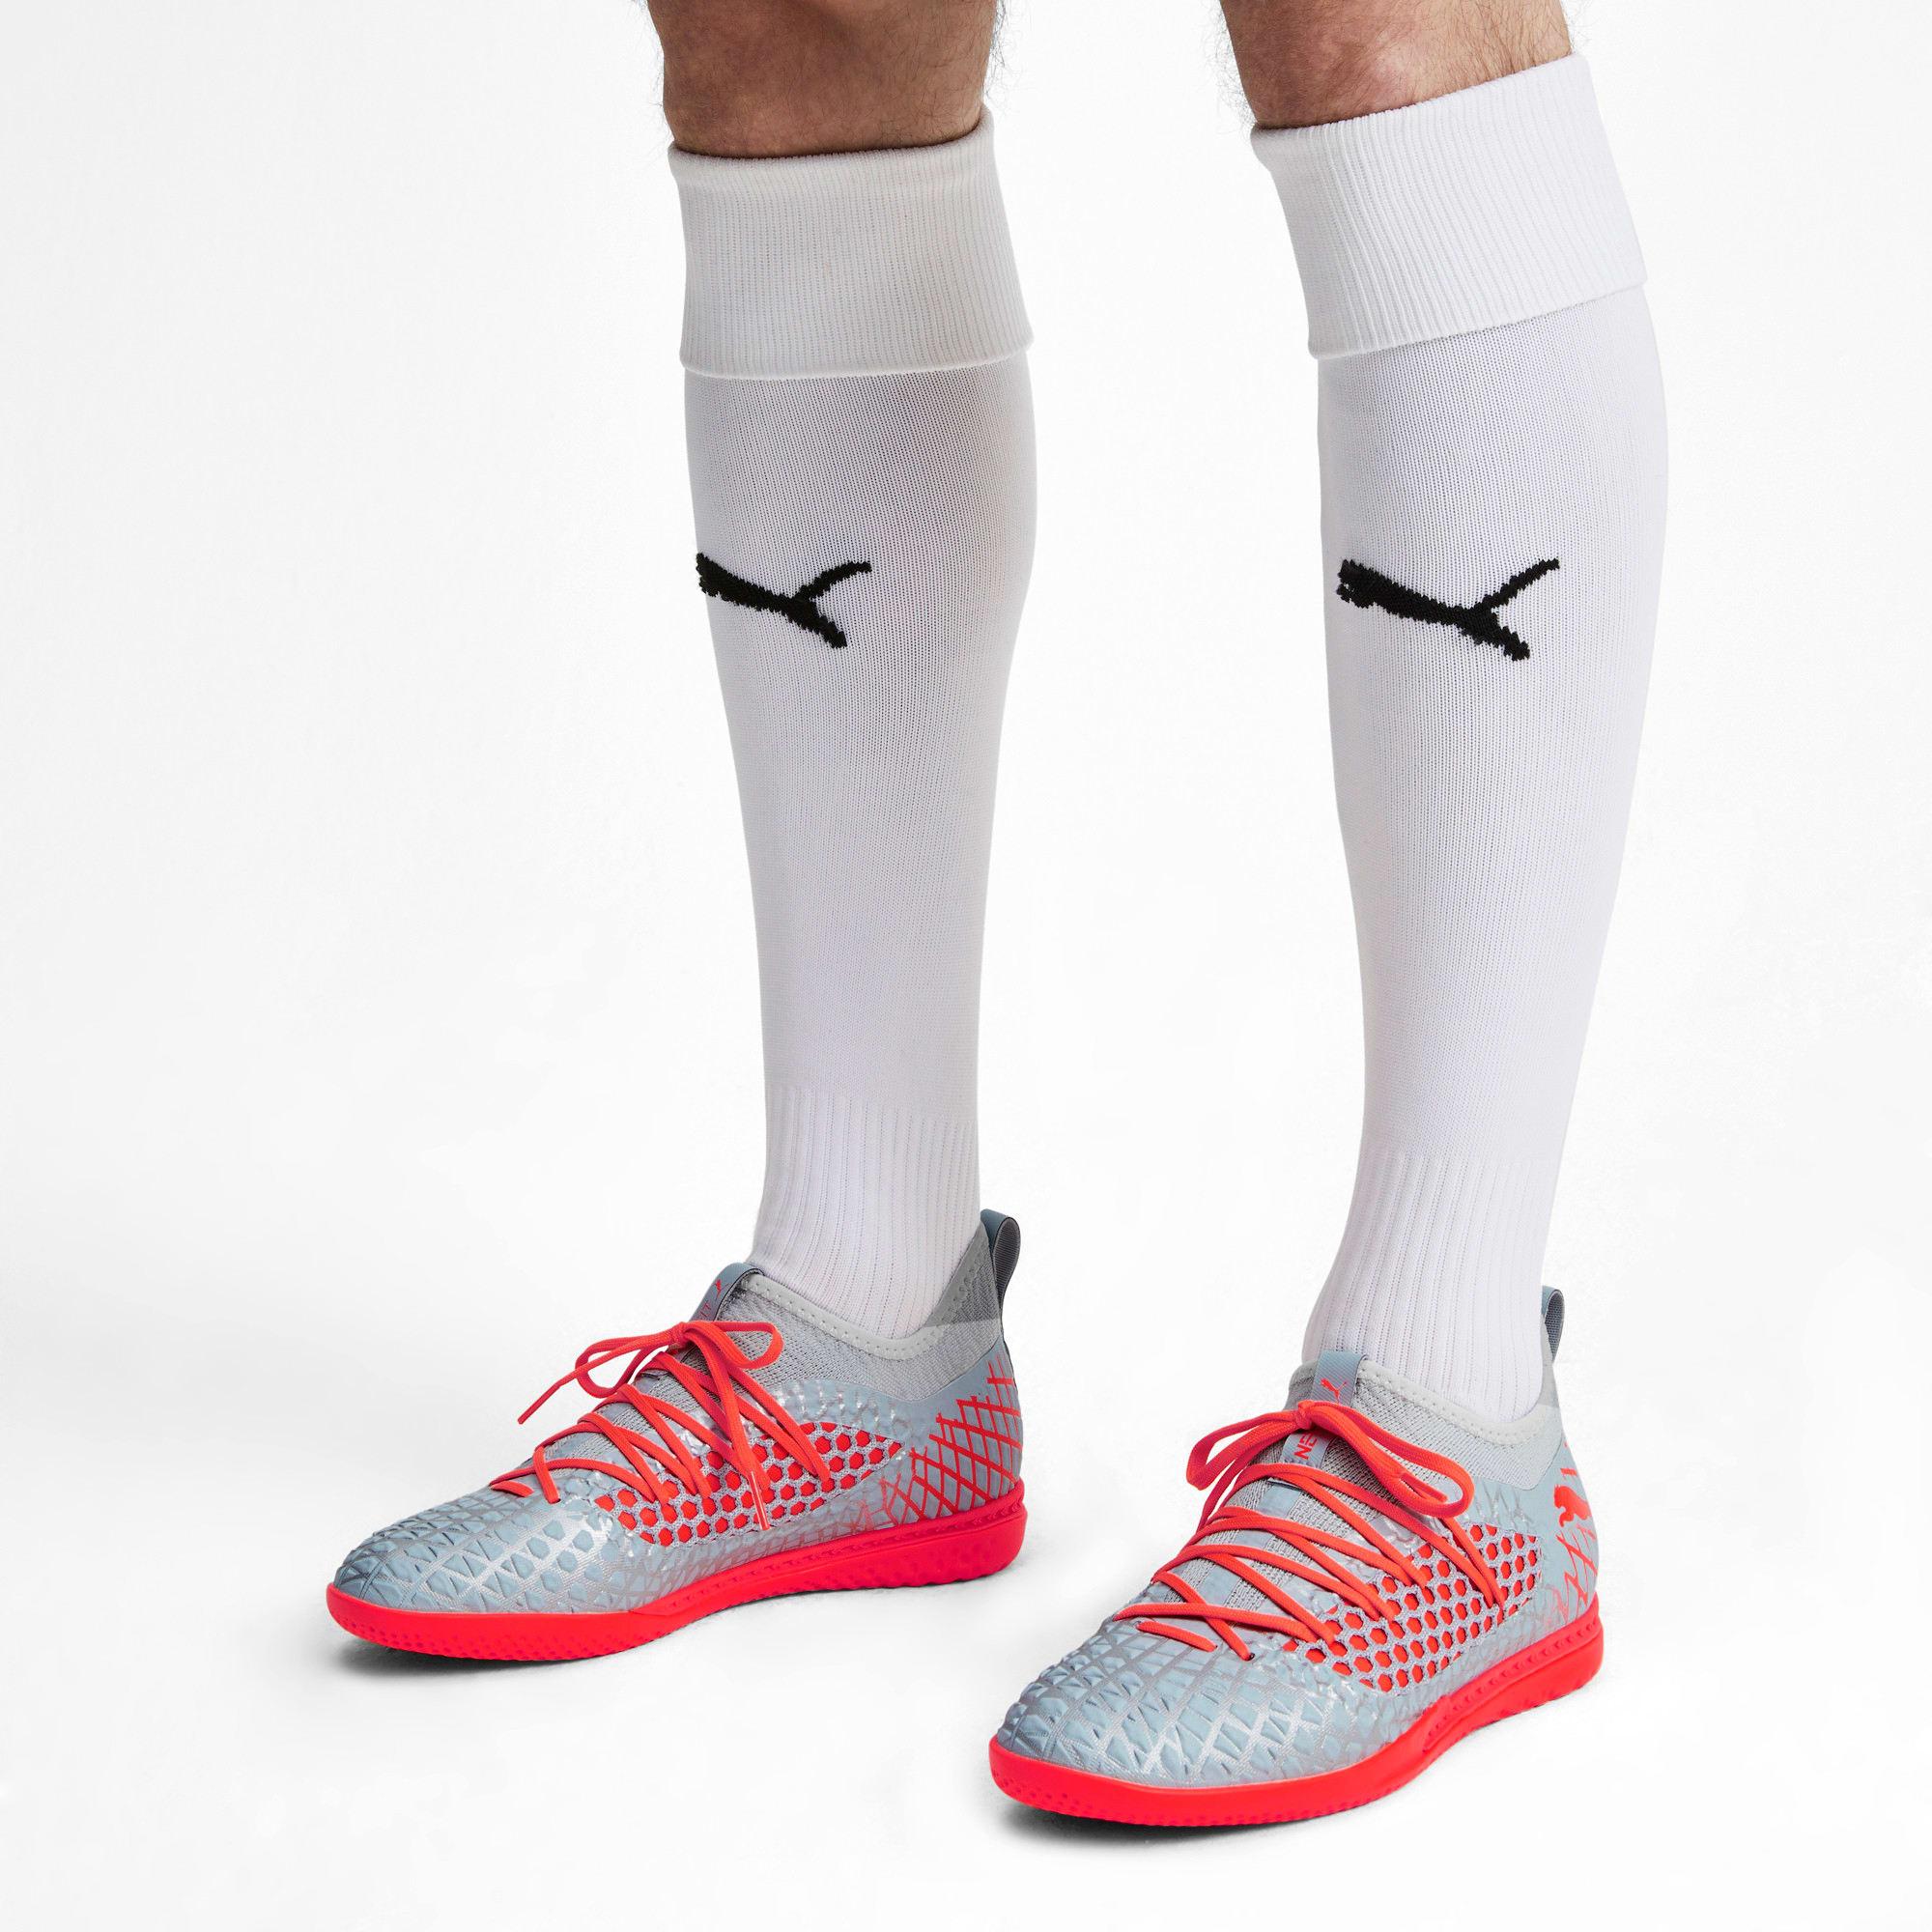 Thumbnail 2 of FUTURE 4.3 NETFIT IT Men's Soccer Shoes, Glacial Blue-Nrgy Red, medium